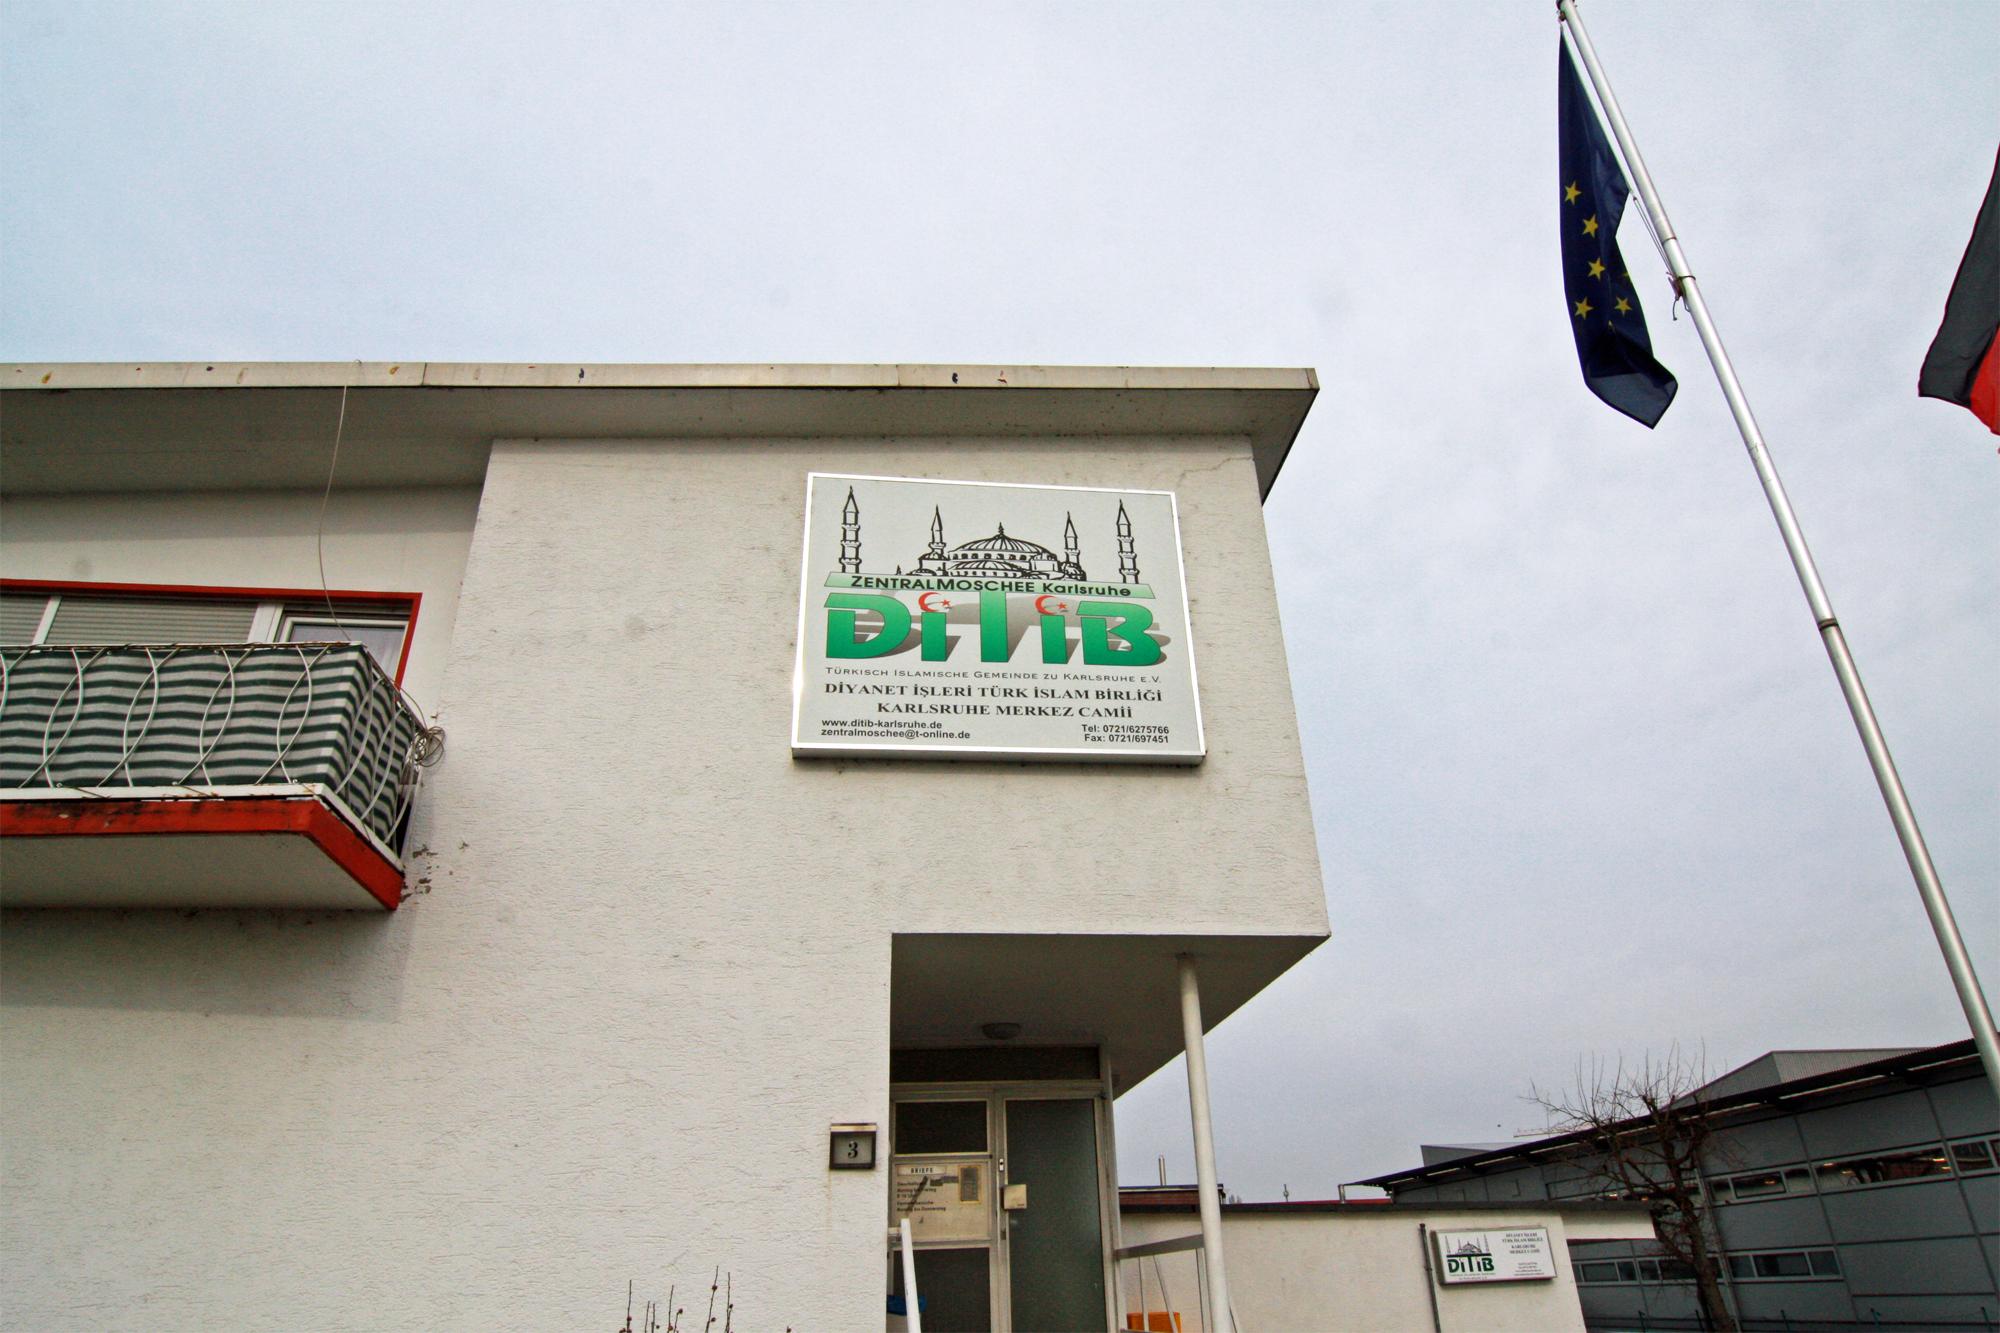 DITIB-Gemeinde Karlsruhe